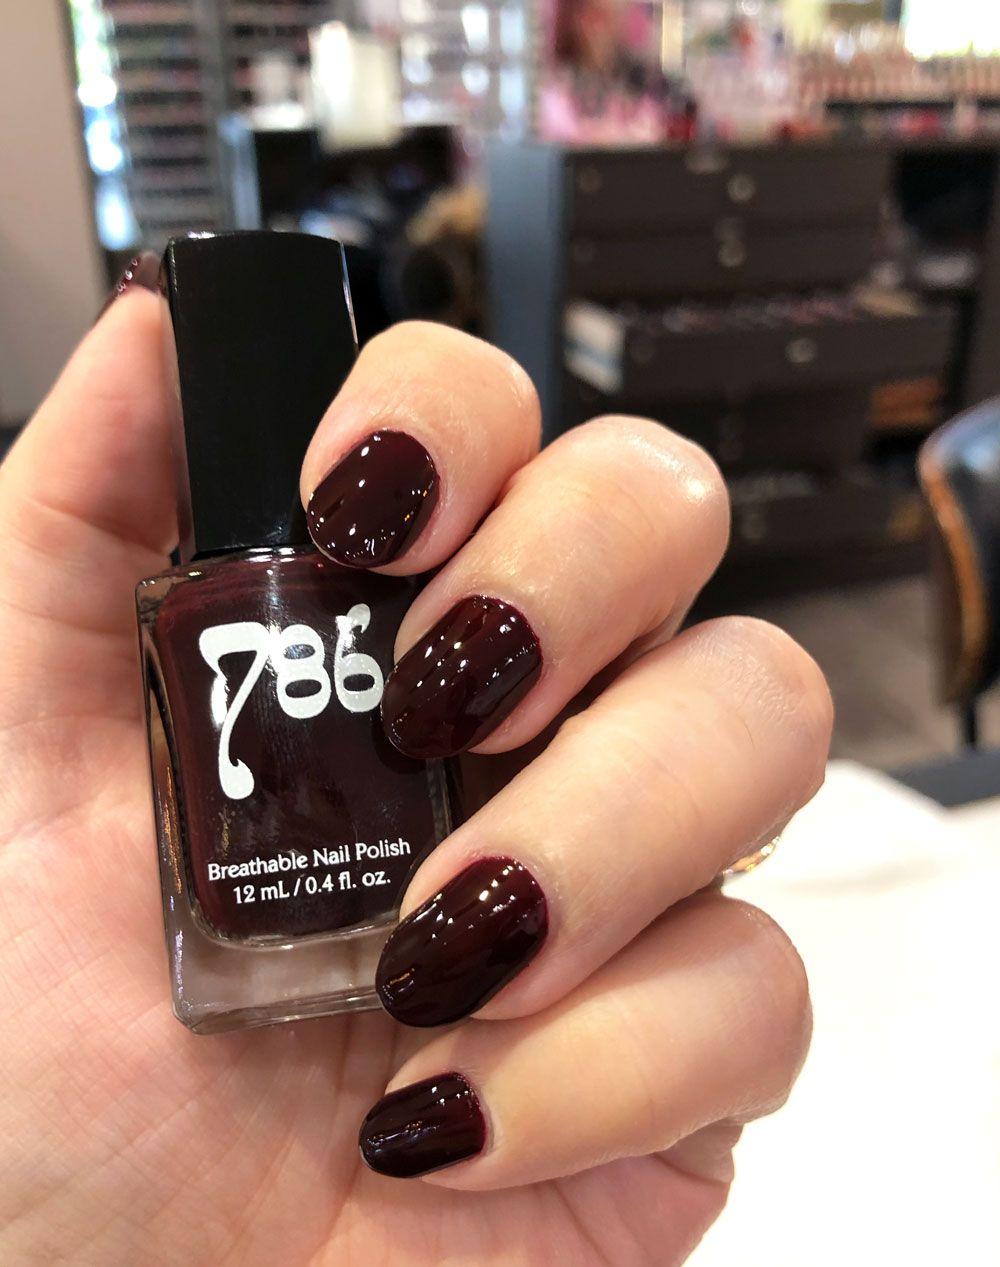 AD 786 halal vegan cruelty free nail polish – dark burgundy Istanbul #nails #halal #nailpolish #crueltyfree